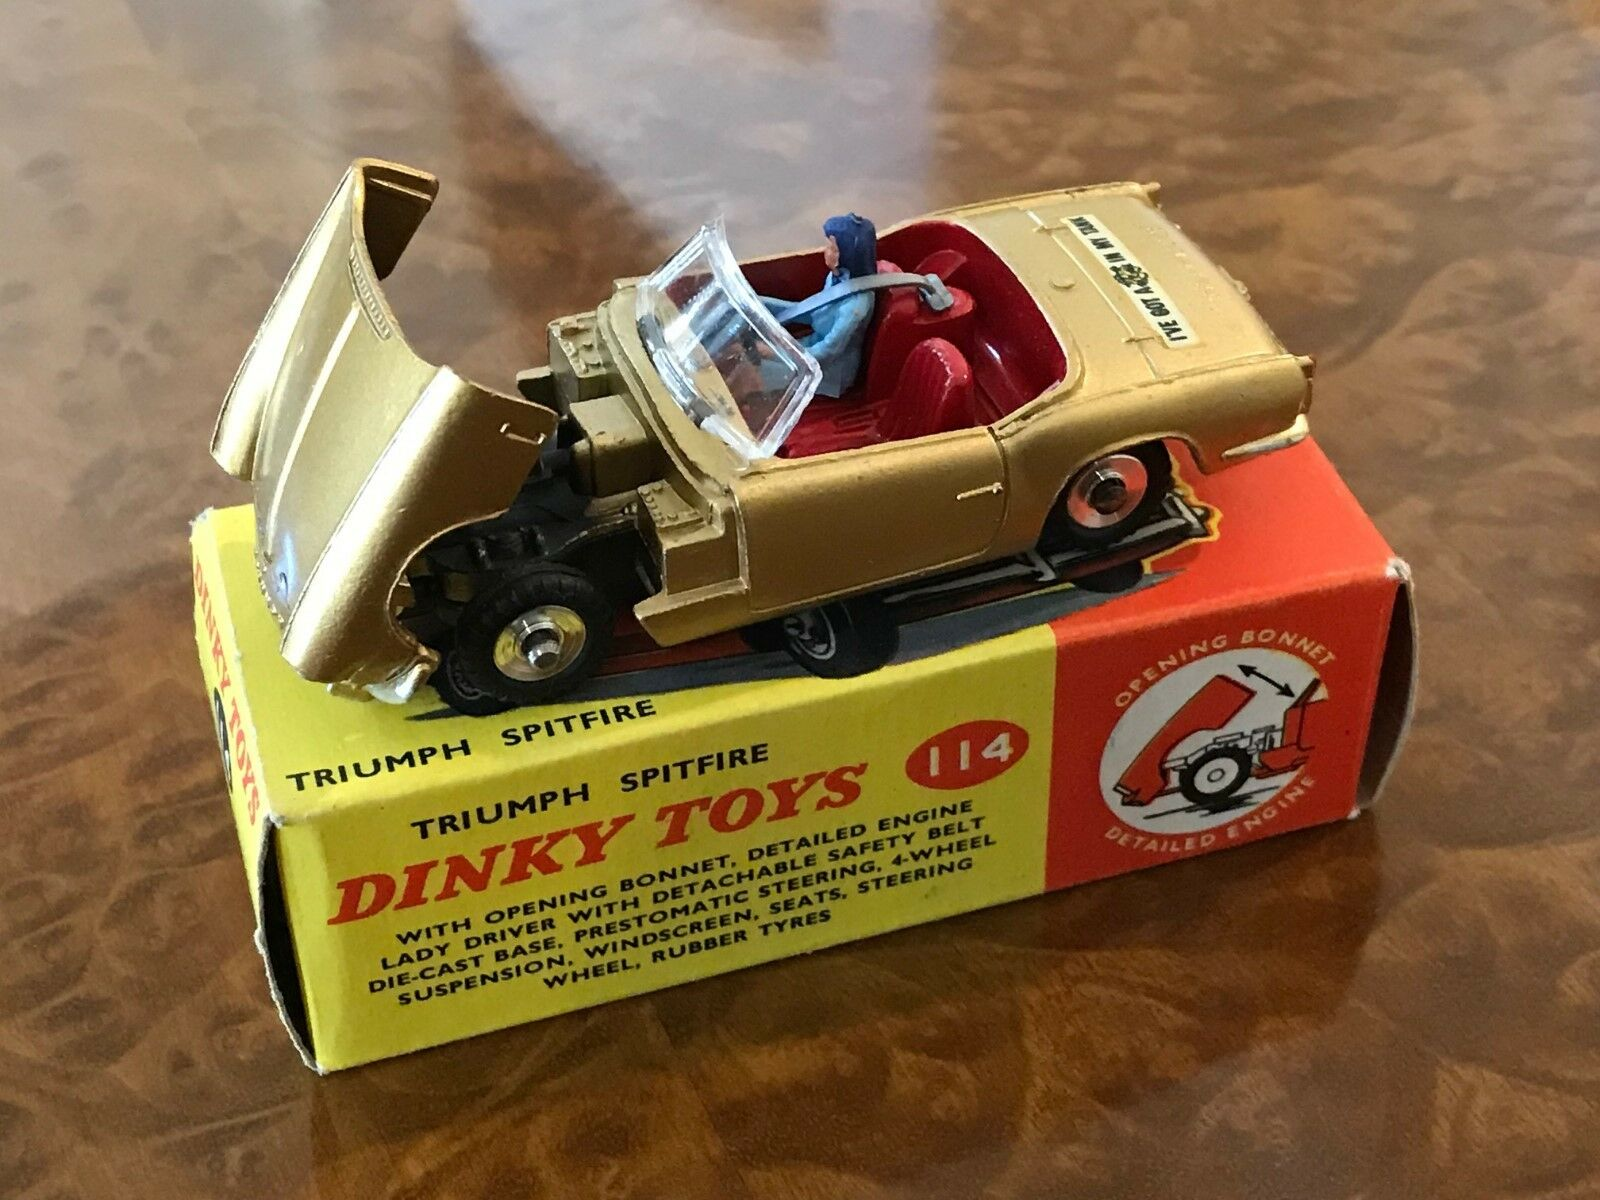 Vintage Dinky Toys MIB Triumph Spitfire Gold Metallic No. 114